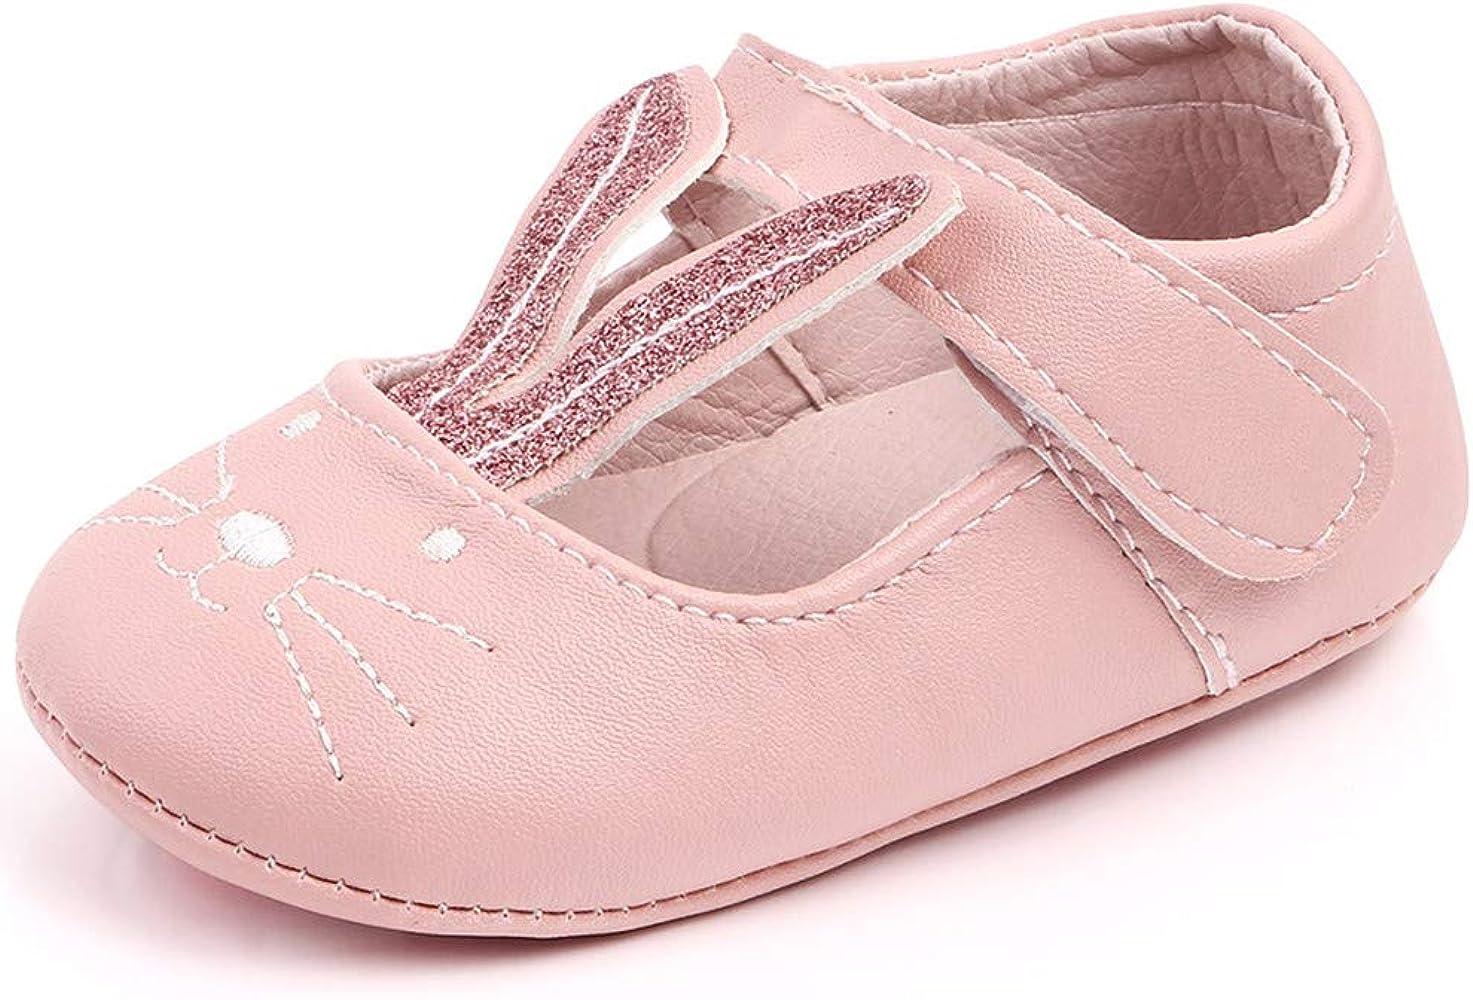 Babys shop Kids Baby Shoes Prewalker Flower Soft Sole Infant Girl First Walkers Booties for Newborn Anti-Slip Crib